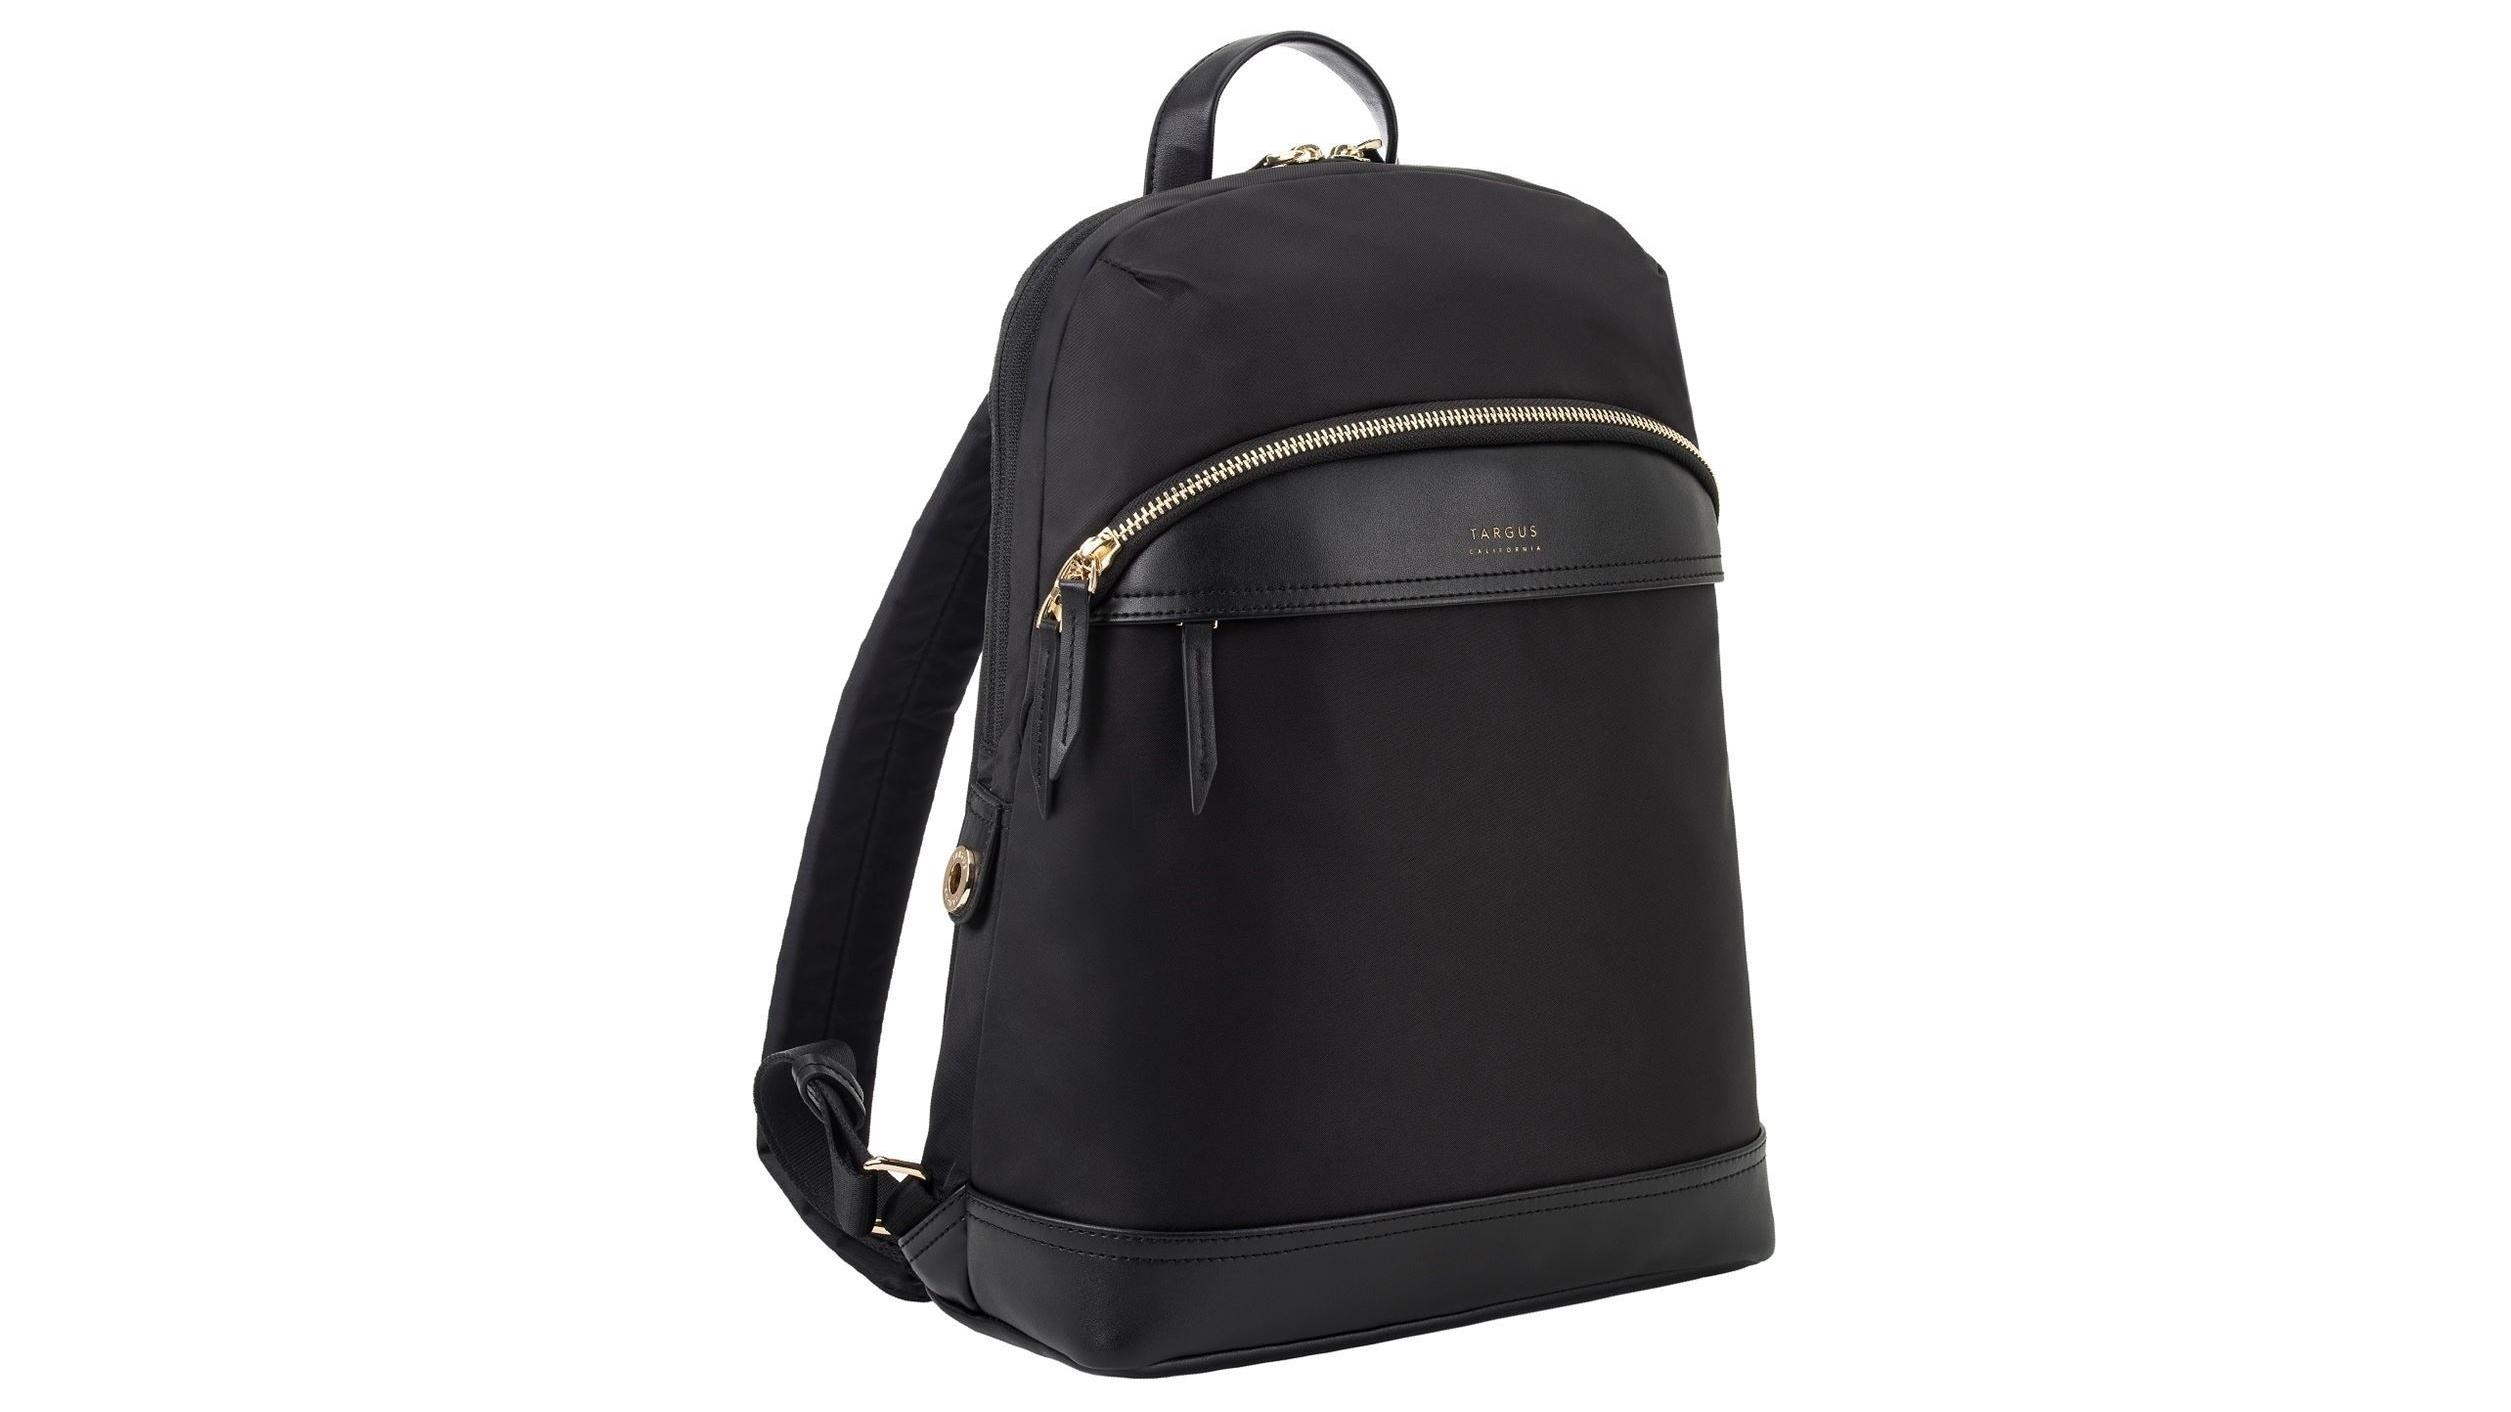 4366e3856 Targus 12-inch Newport Mini Backpack - Black